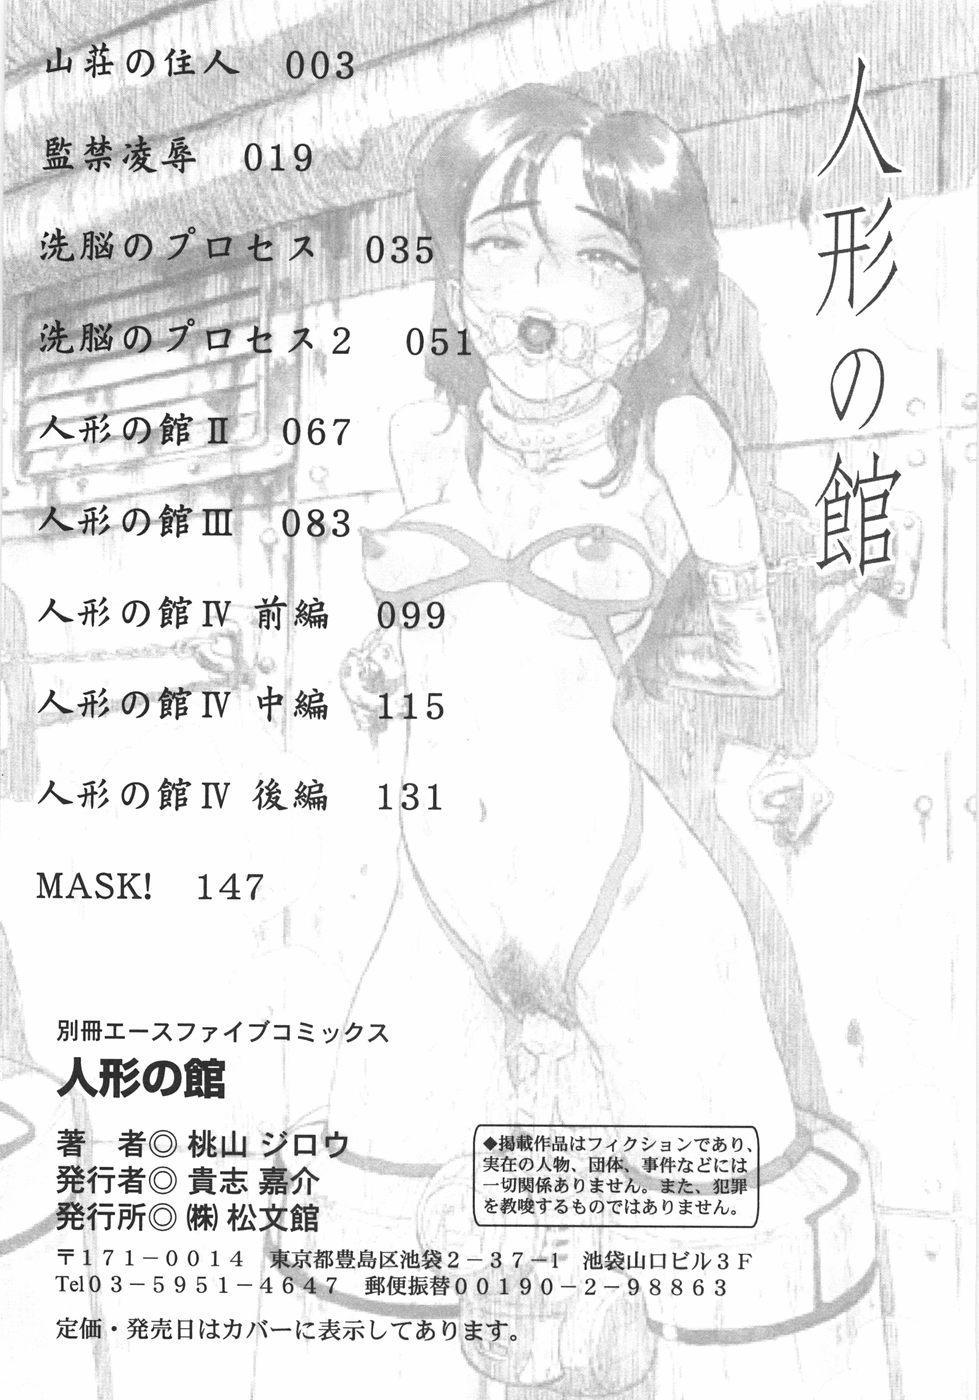 Ningyou no Yakata - The Doll House 169